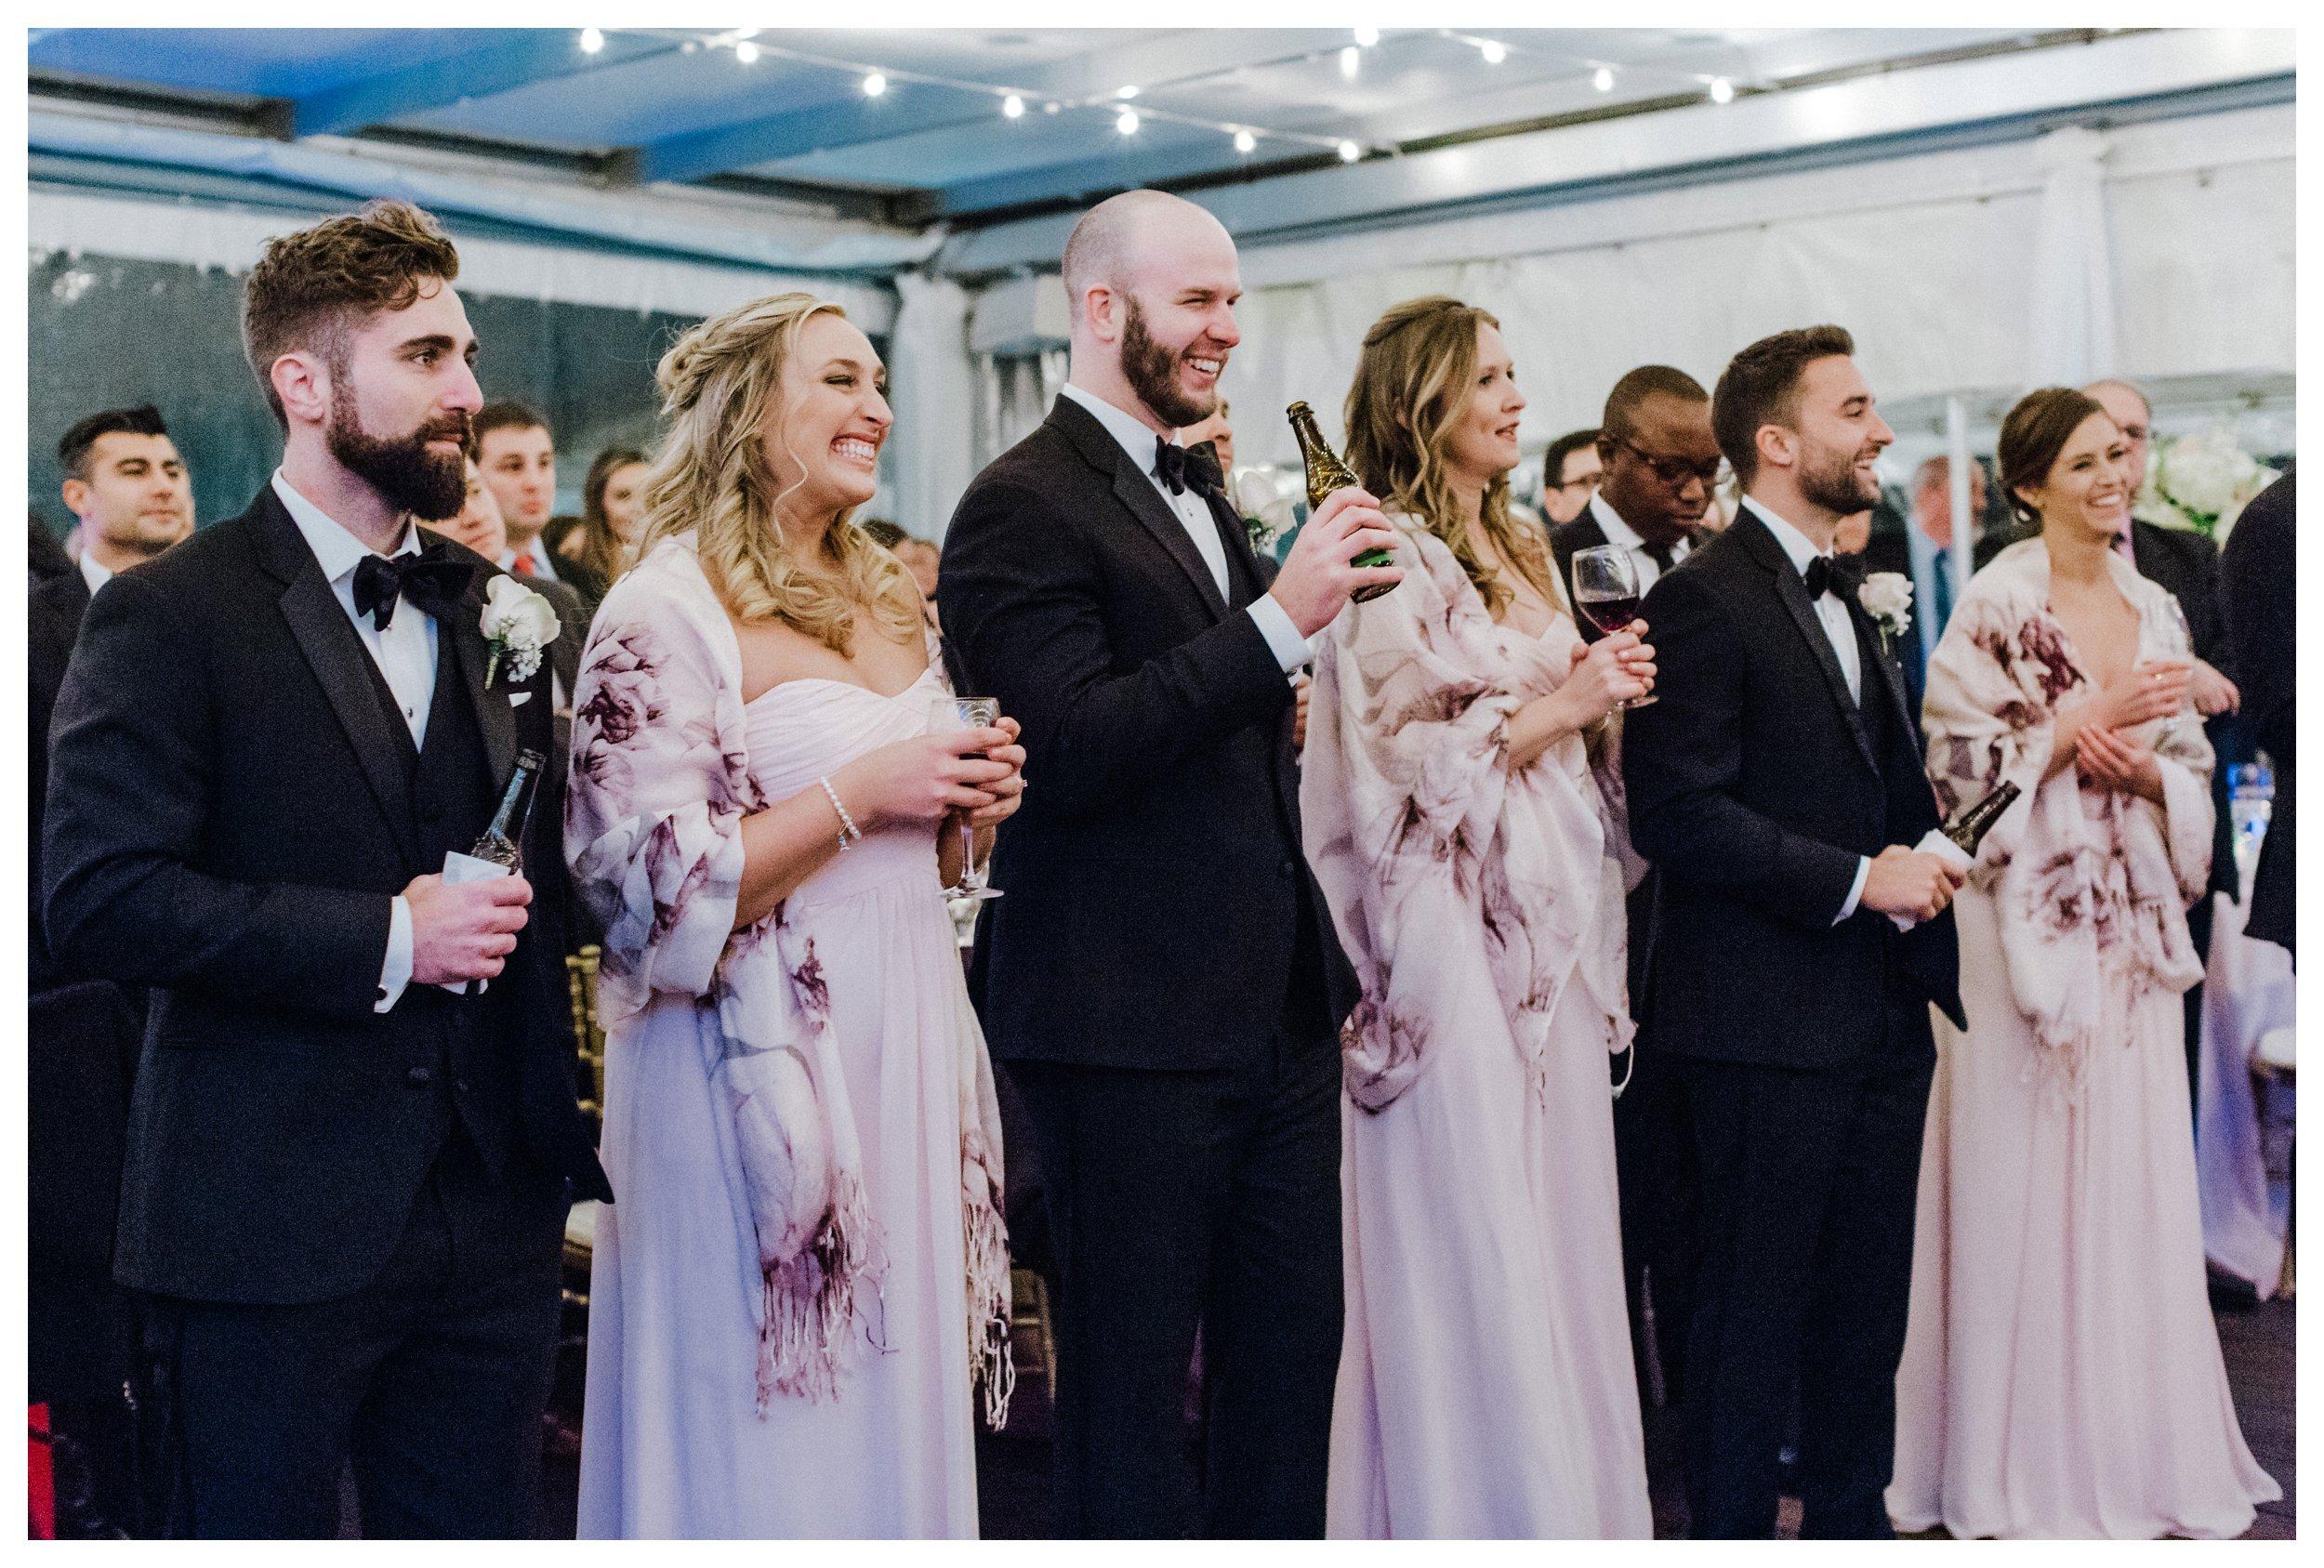 washington-dc-wedding-photographer-48.JPG